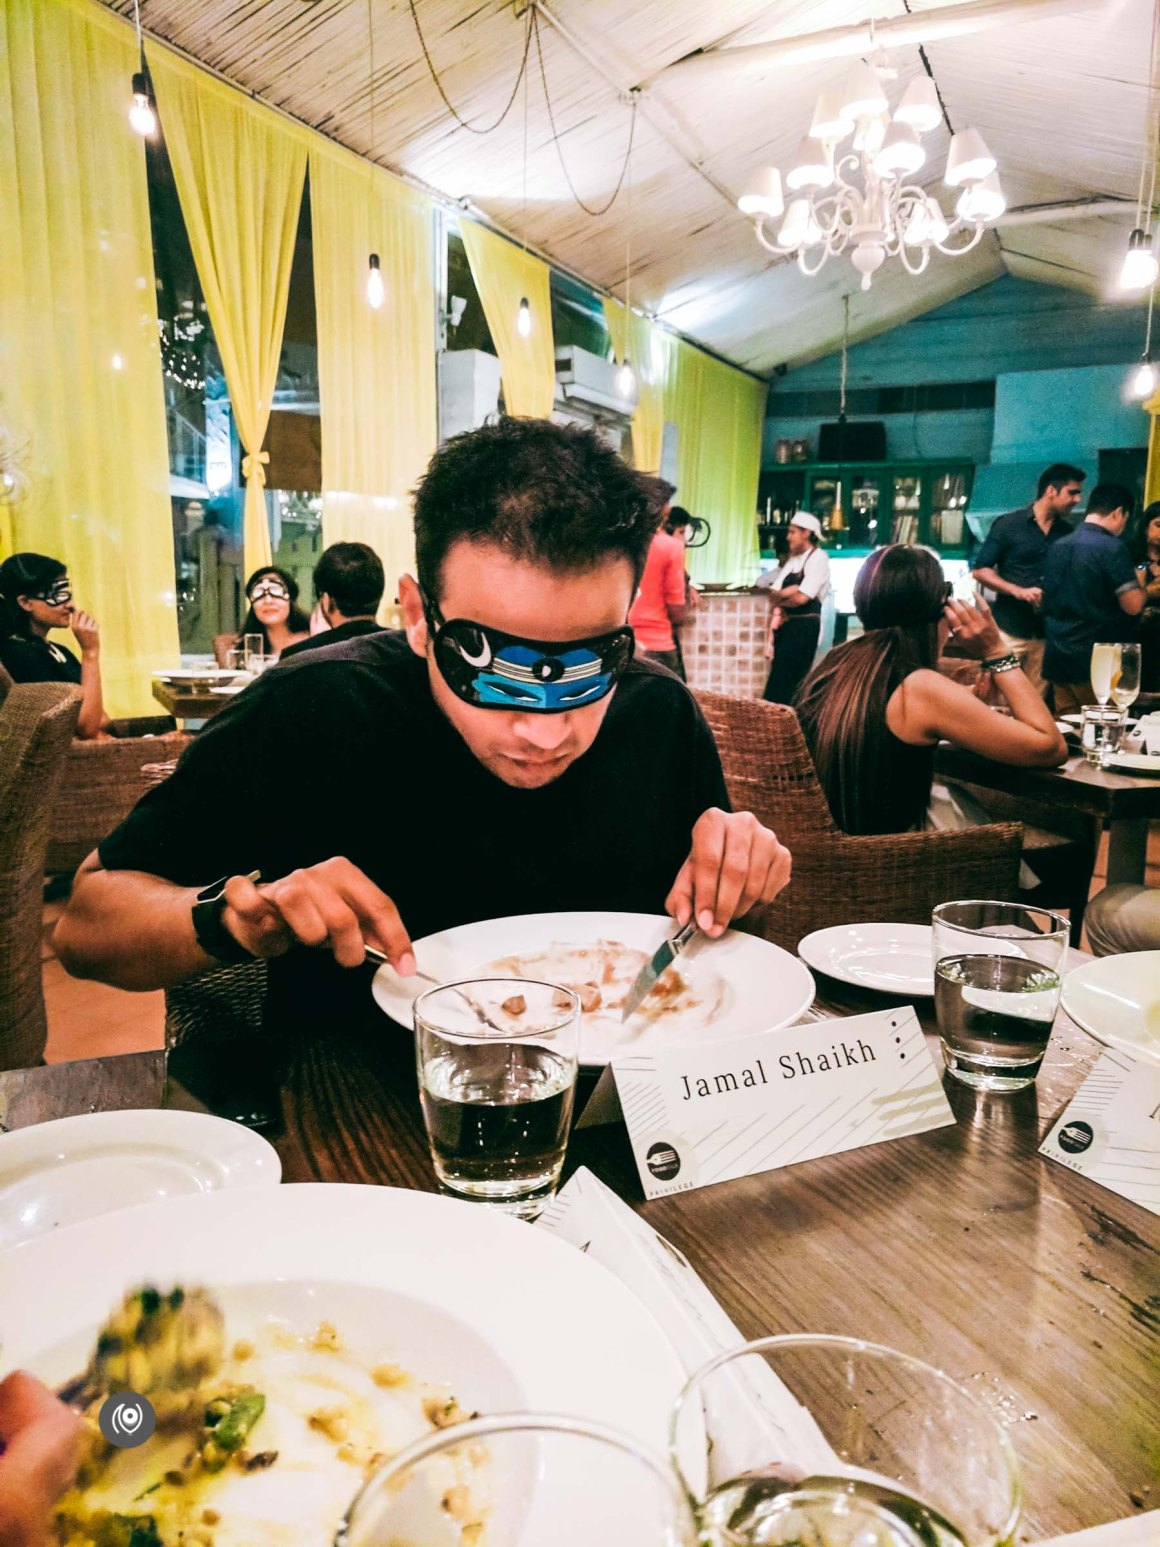 Naina.co, Naina Redhu, FoodTalk, Food Talk India, FoodTalkIndia, FoodTalk India, EyesForDining, Olive, Qutub, New Delhi, Restaurant, Food, Dinner, Blindfold, Blindfold Meal, Blindfolded, Eating, Chef Gaurav, Anjali Batra, Shuchir Suri, PlayClan, Food Photographer, Food Blogger, Luxury Blogger, Luxury Photographer, Lifestyle Photographer, Lifestyle Blogger, EyesForIndia, Dessert, Drinks